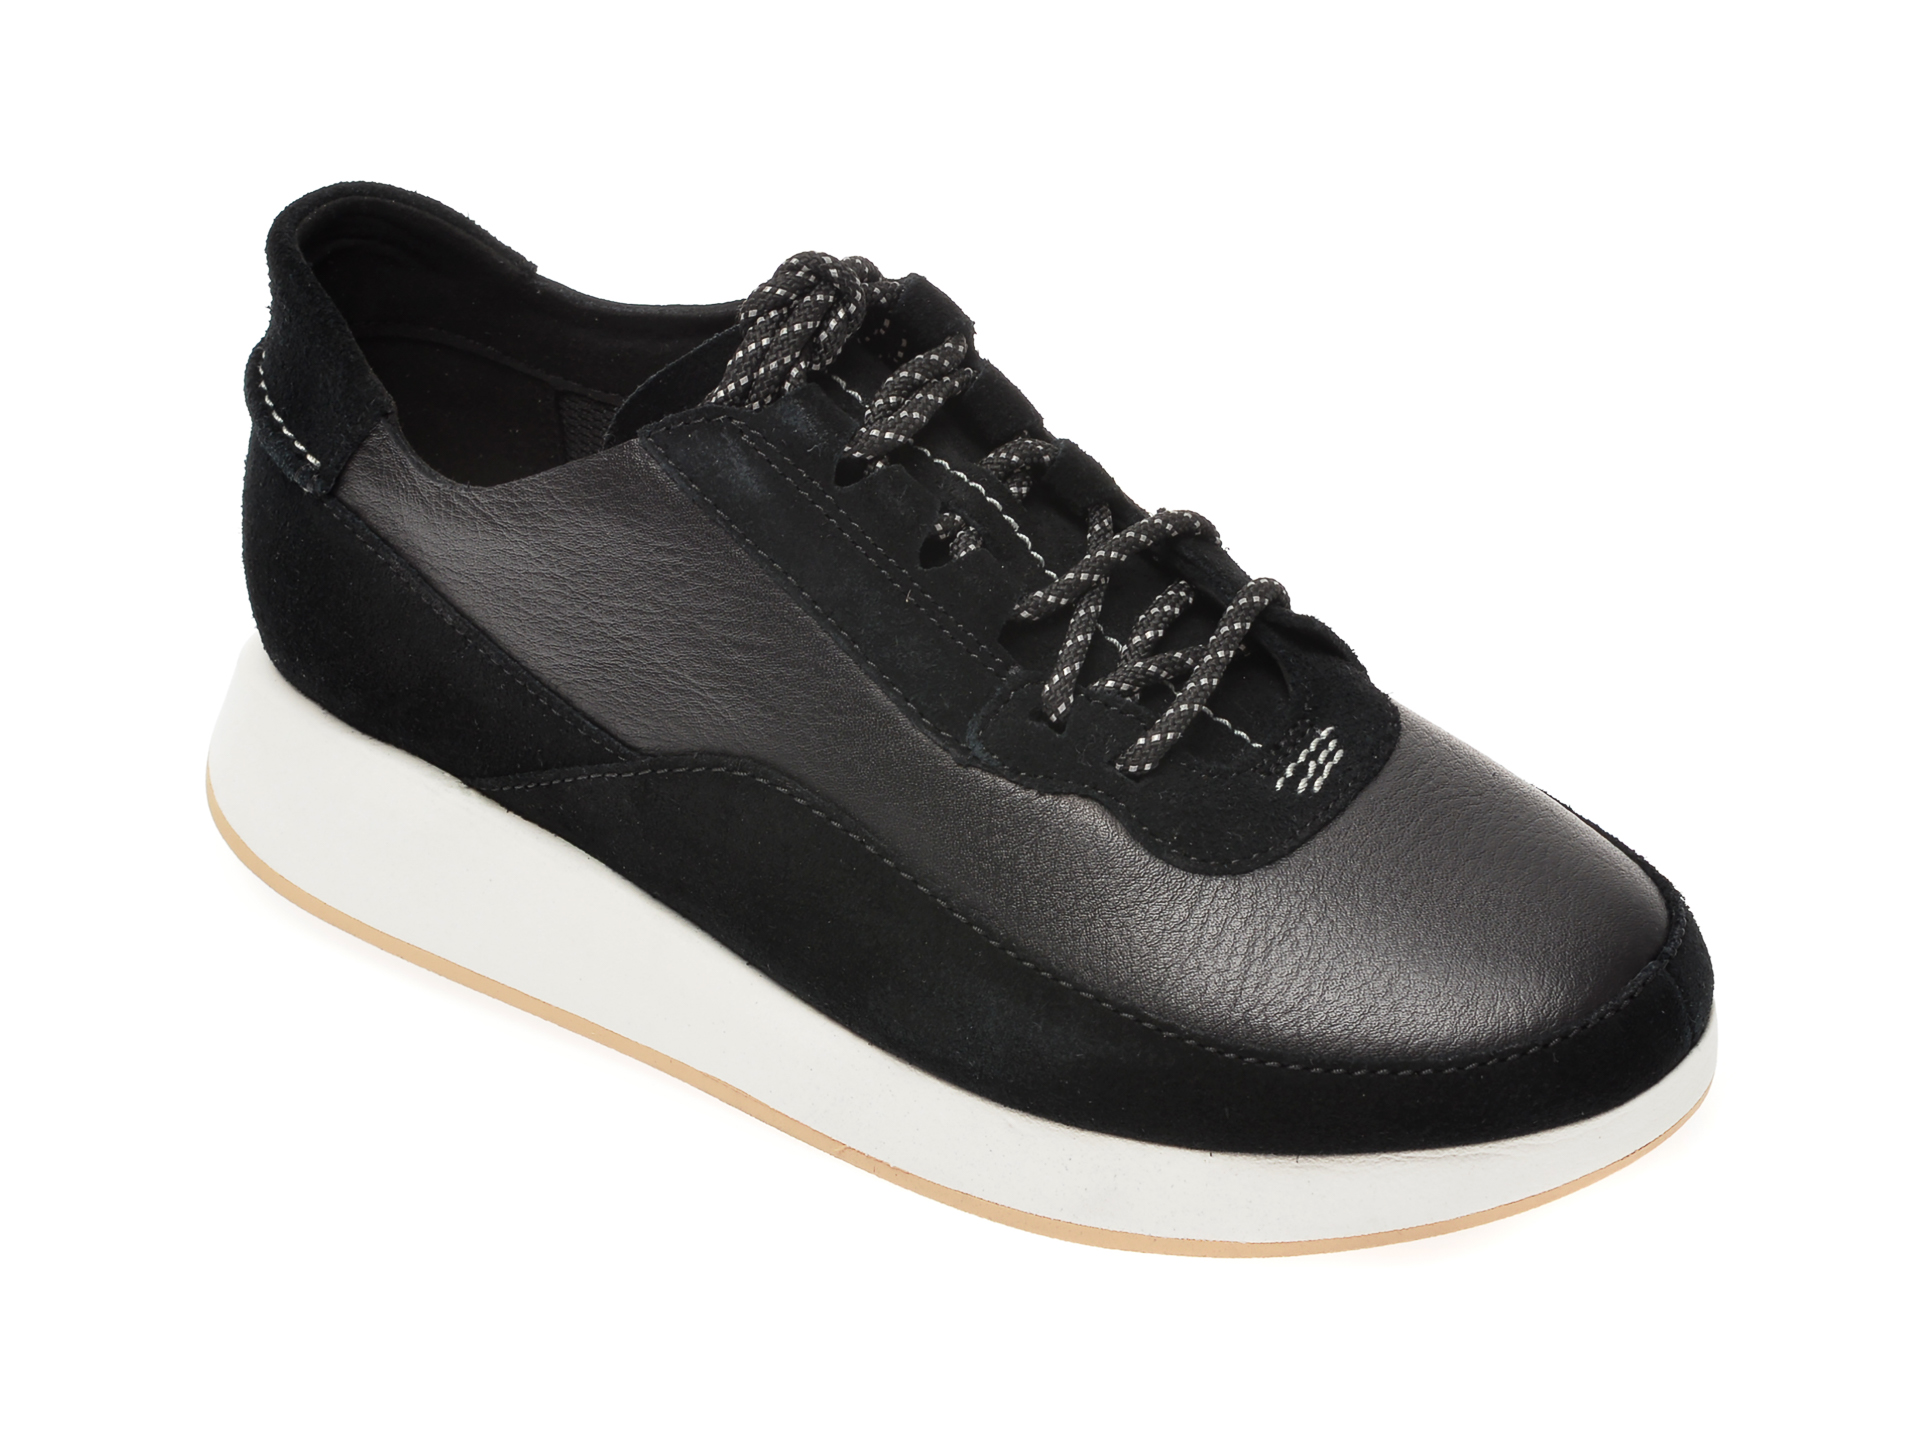 Pantofi CLARKS negri, Kiowa Pace, din piele naturala imagine